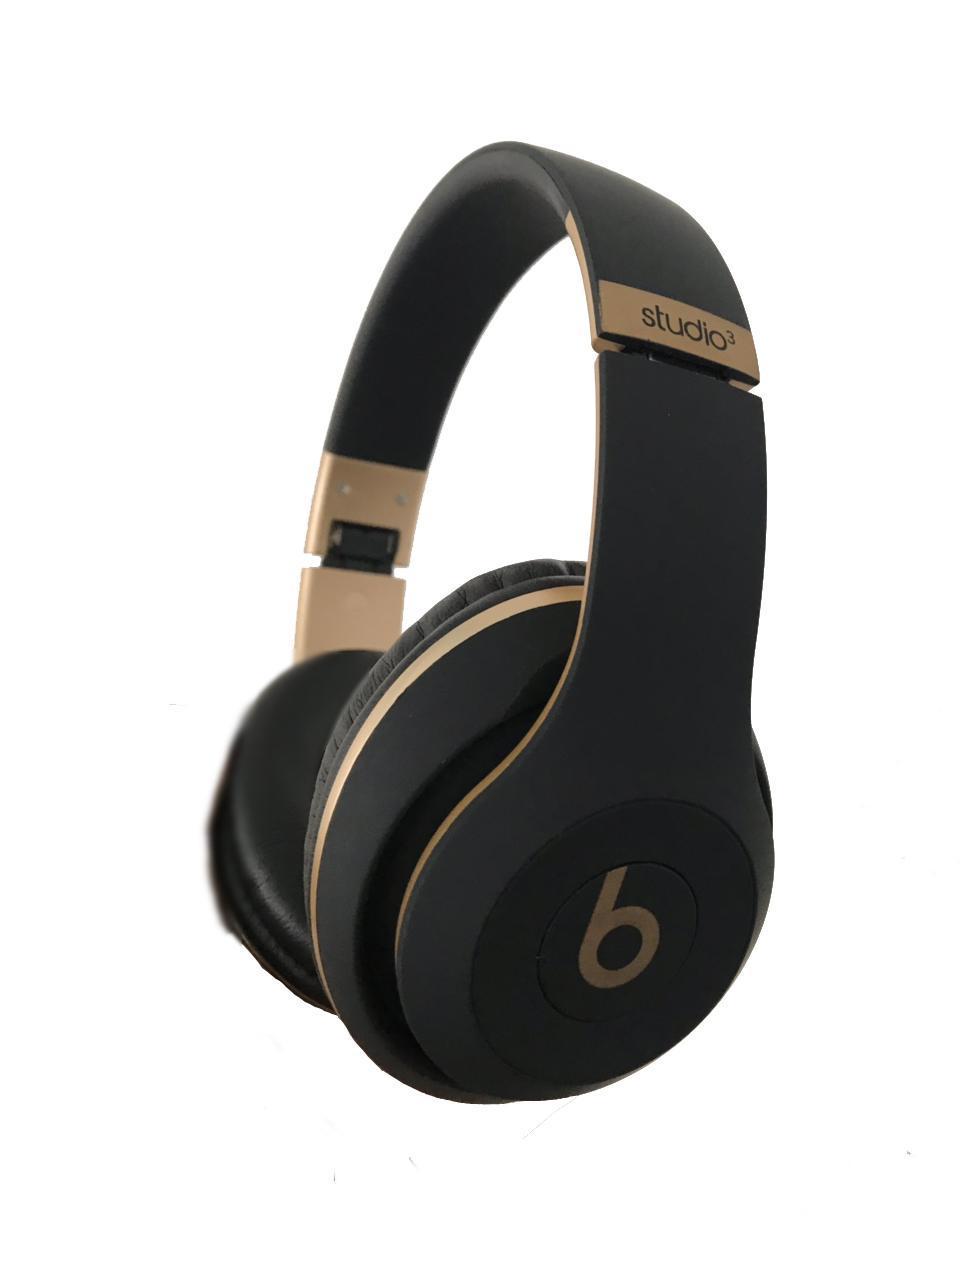 Tai Nghe Bluetooth và Tai Nghe chụp tai over-ear 2 in 1 Beats Studio 3 wireless Giảm Ồn Âm Bass Cực Chất